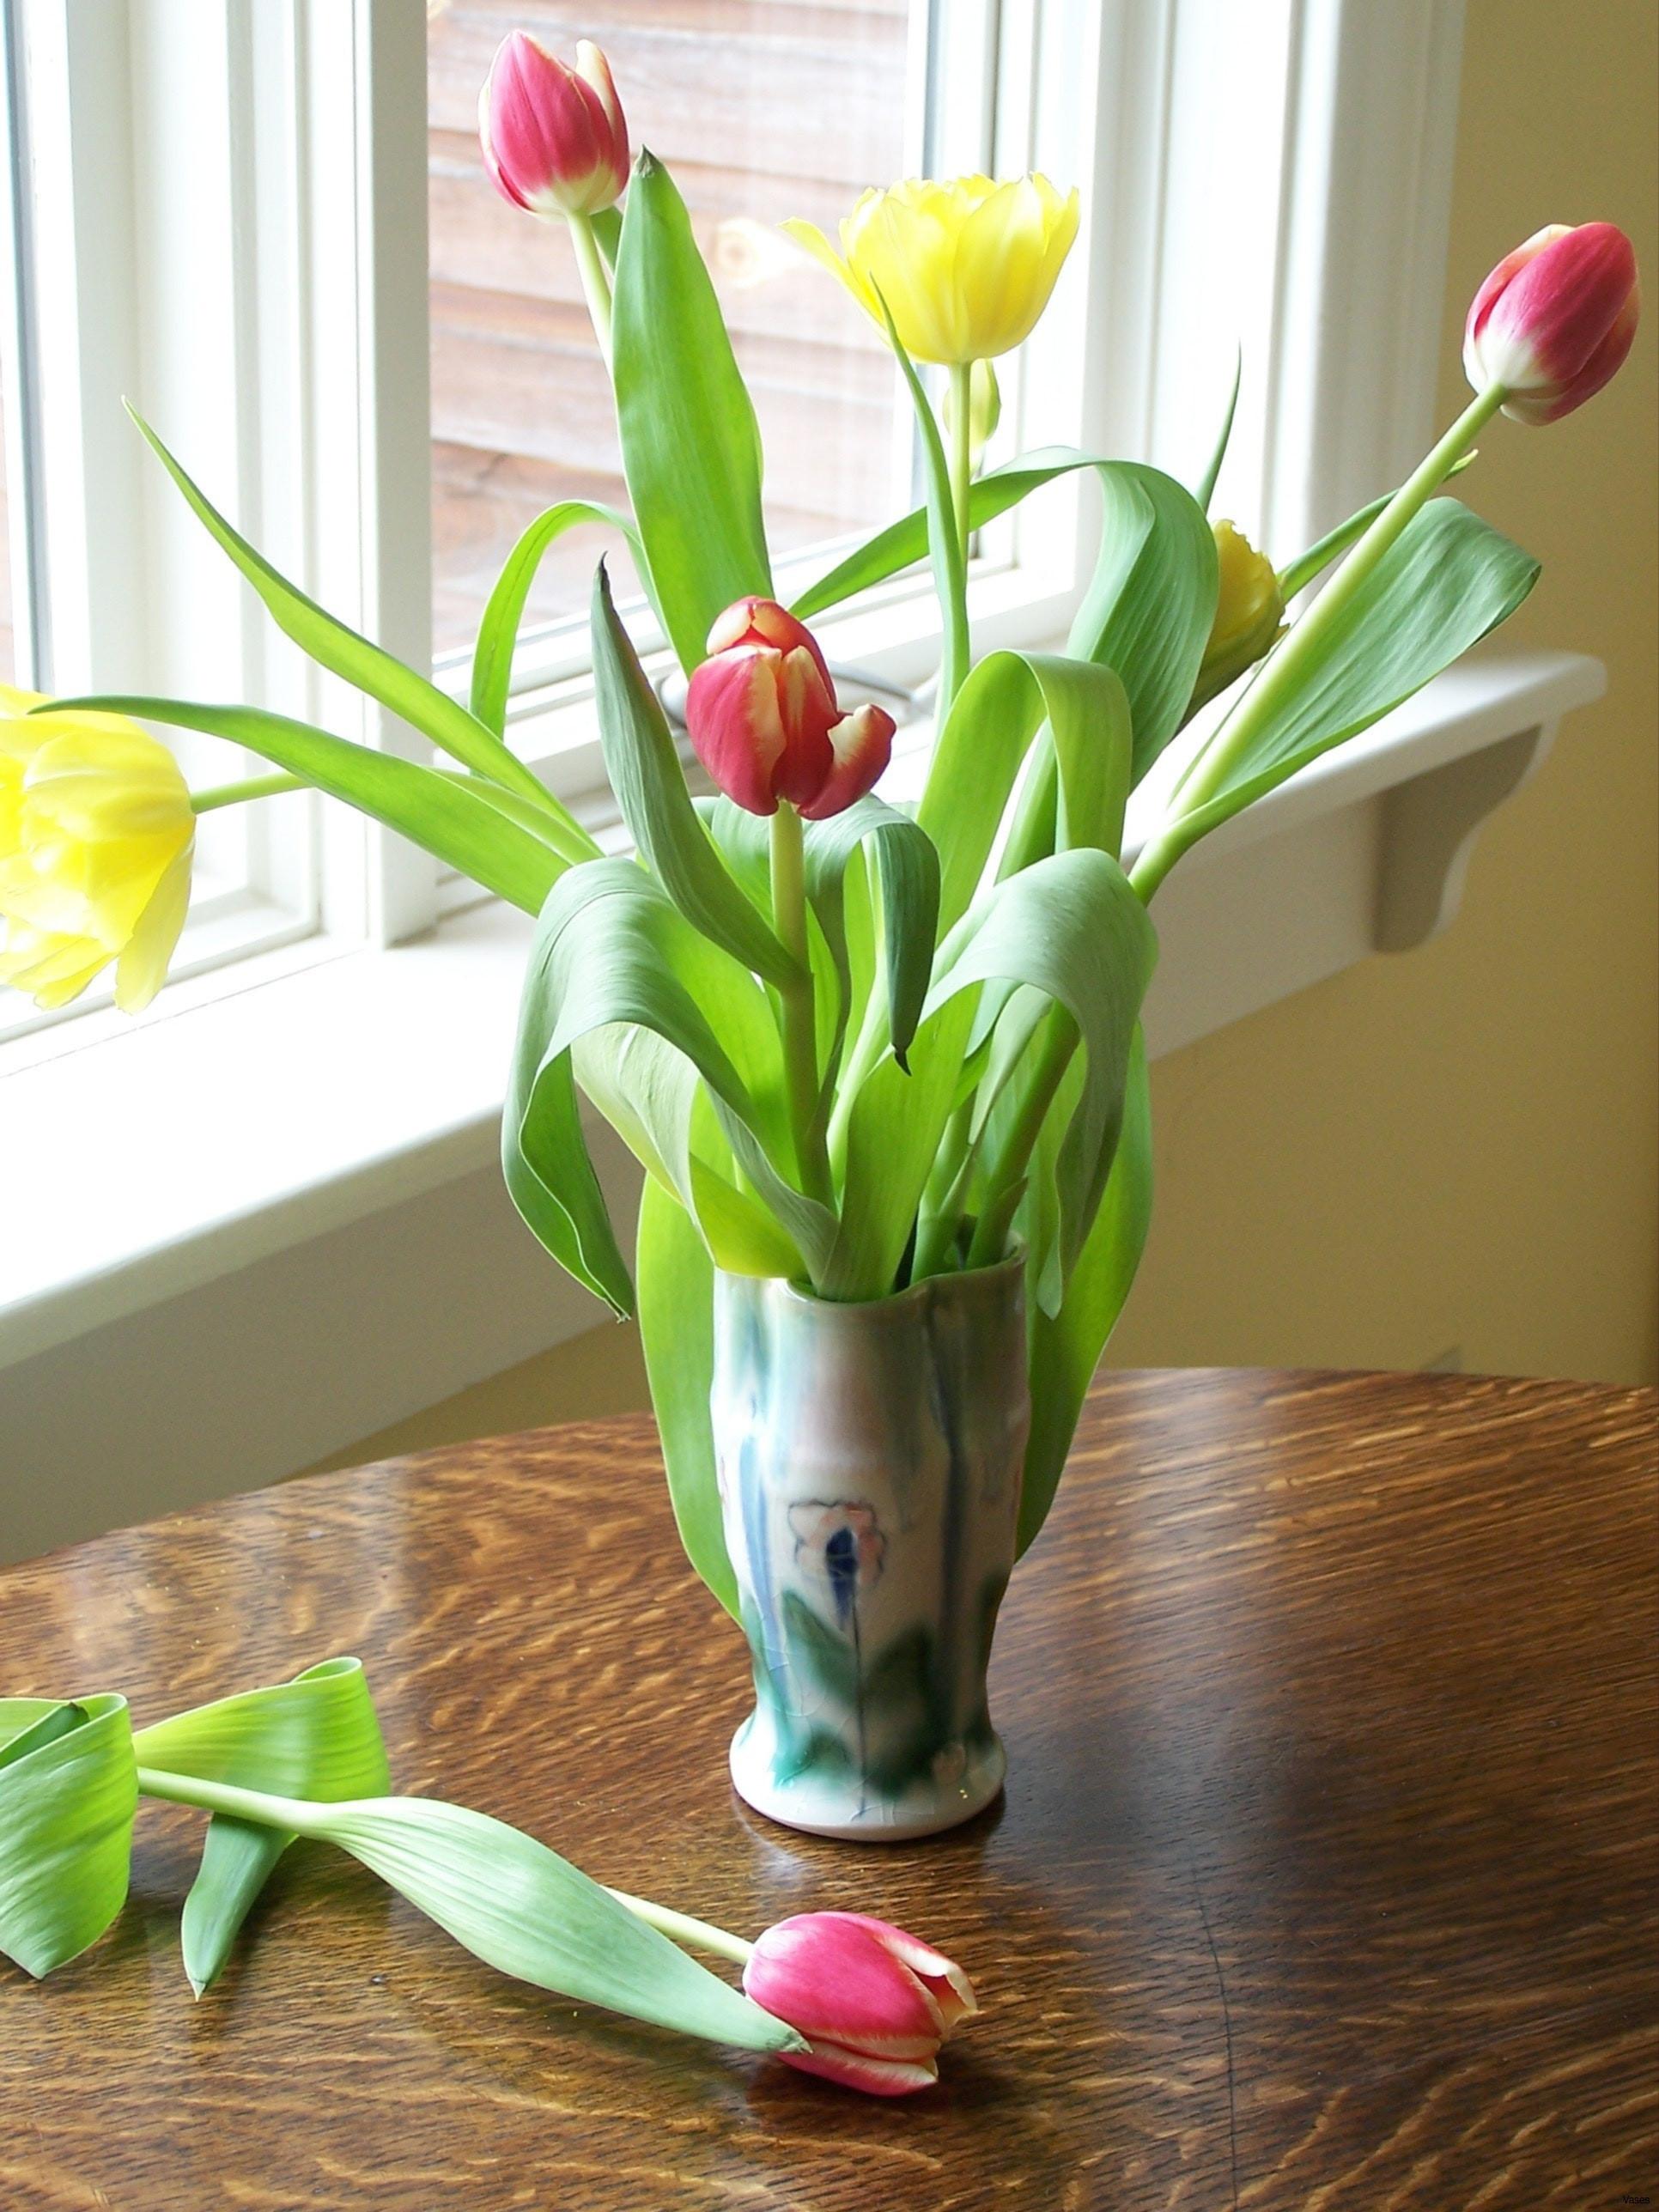 cherry blossom in vase of single flower vase pictures a single flower image best img 1299h inside single flower vase photos il fullxfull l7e9h vases single flower vase ideas zoomi 0d of single